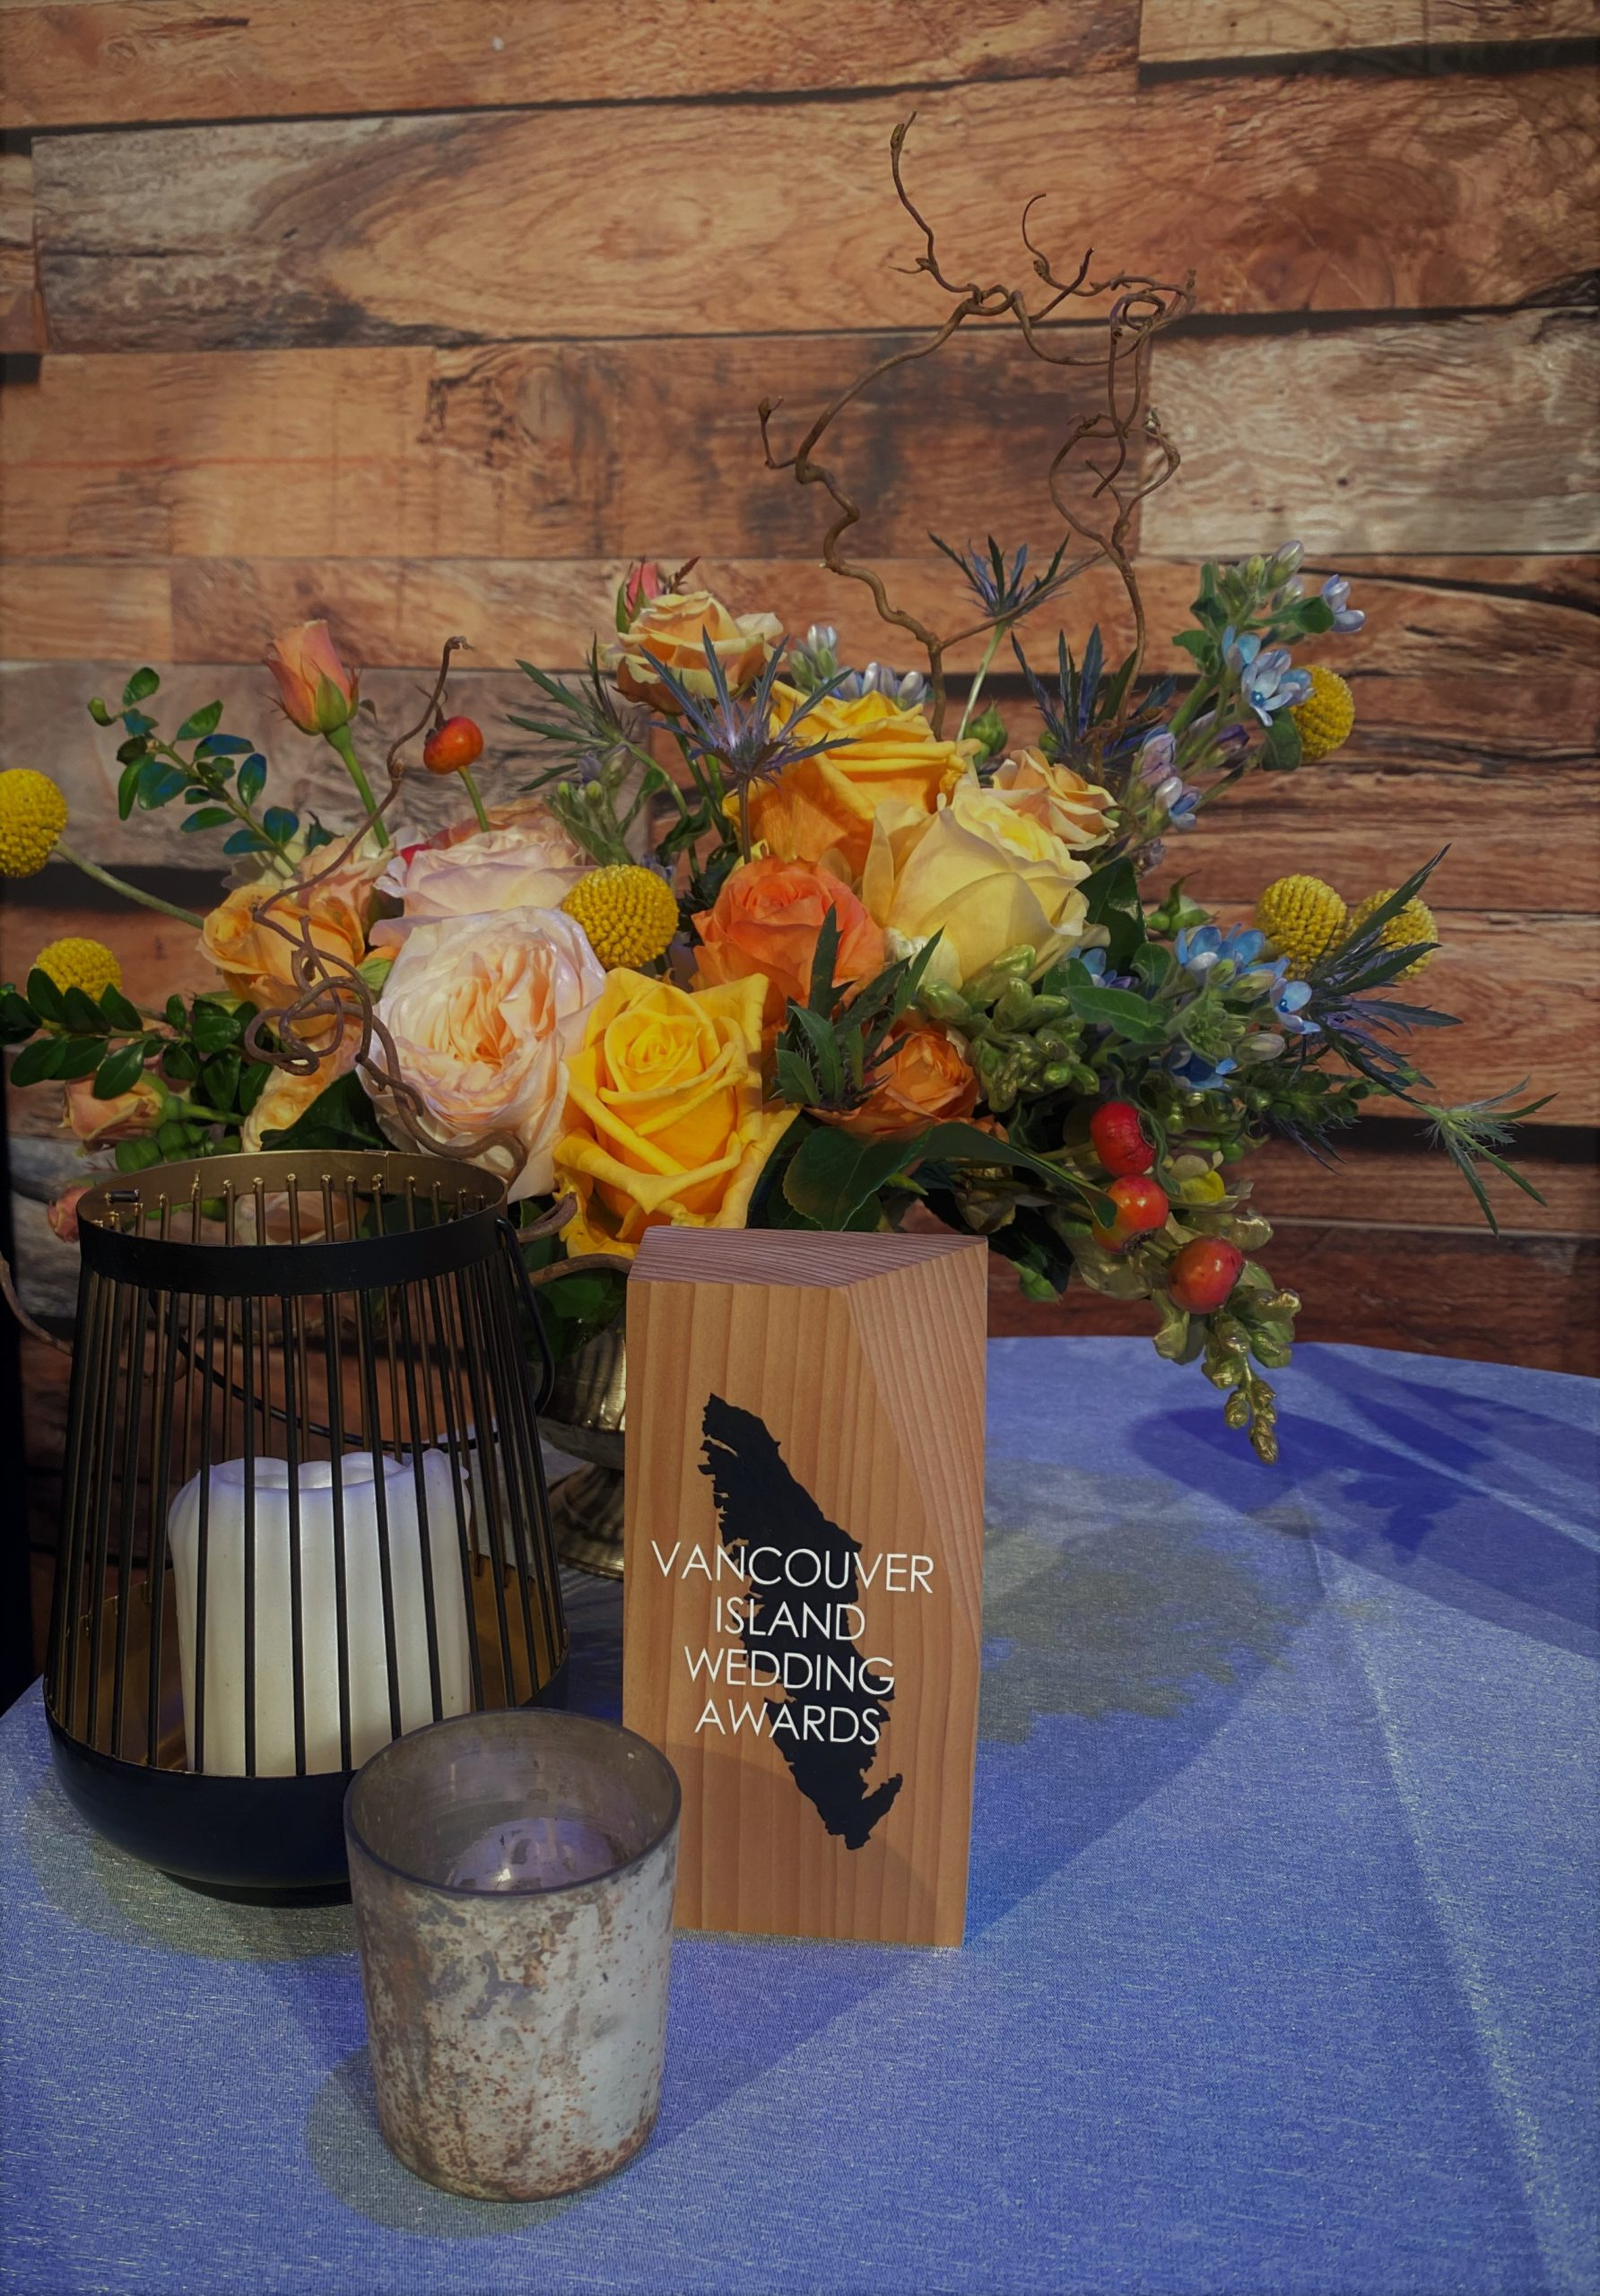 Vancouver Island Wedding Industry Awards 2020 by Melanie Anne Designs